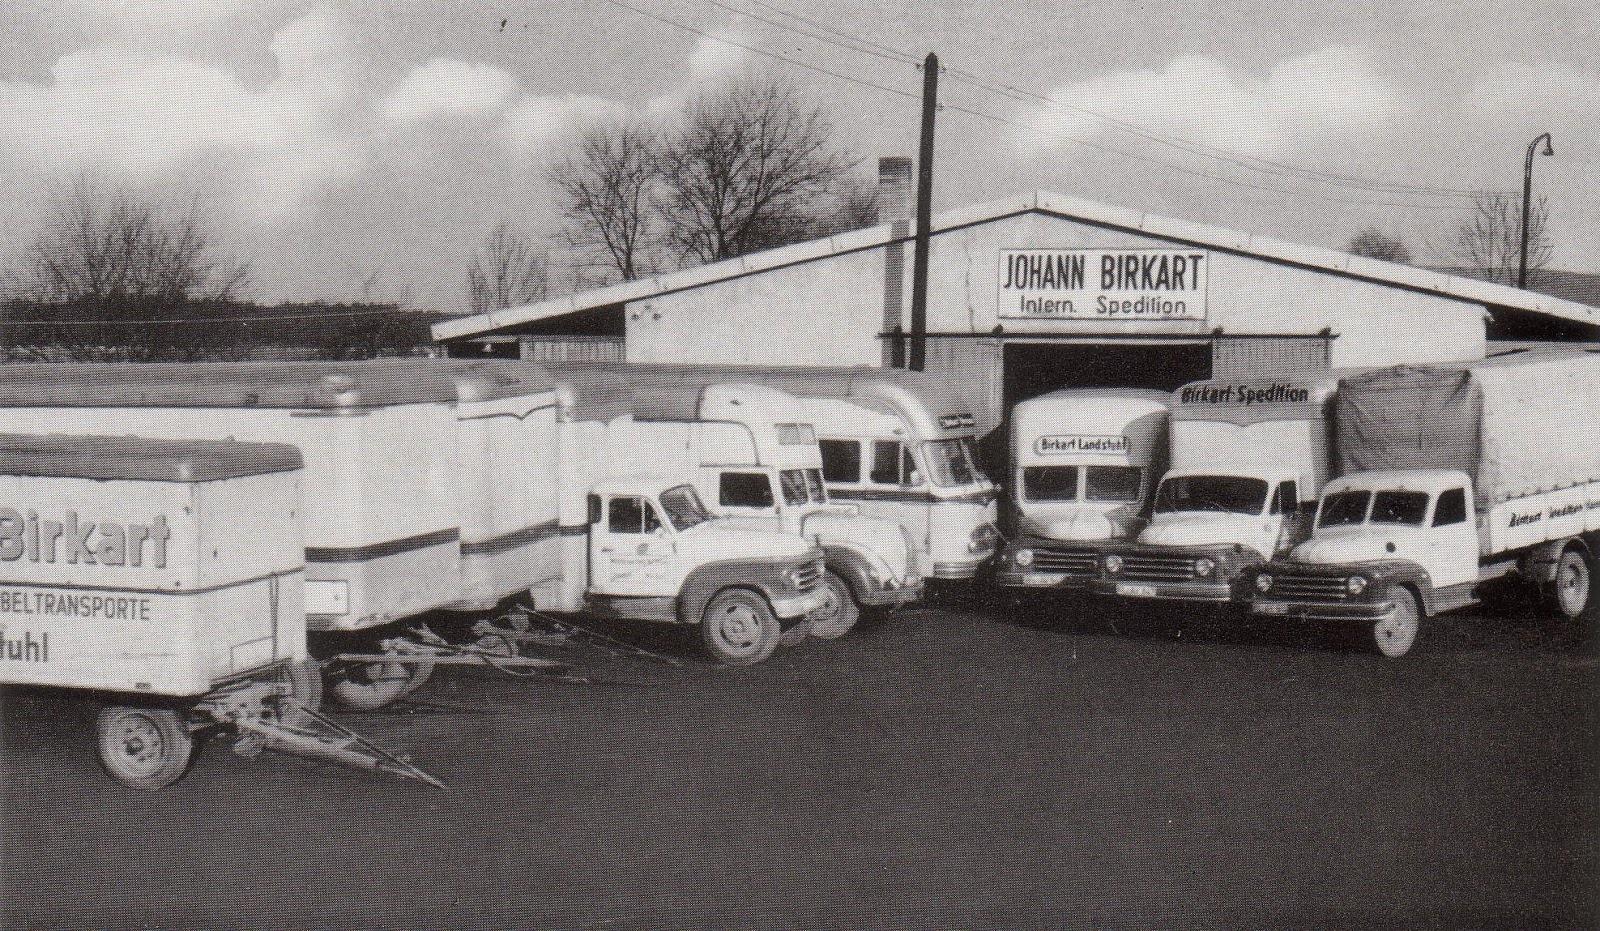 Birkart-1959-Landshut-Internationale-Spedition-Johann-Birkart